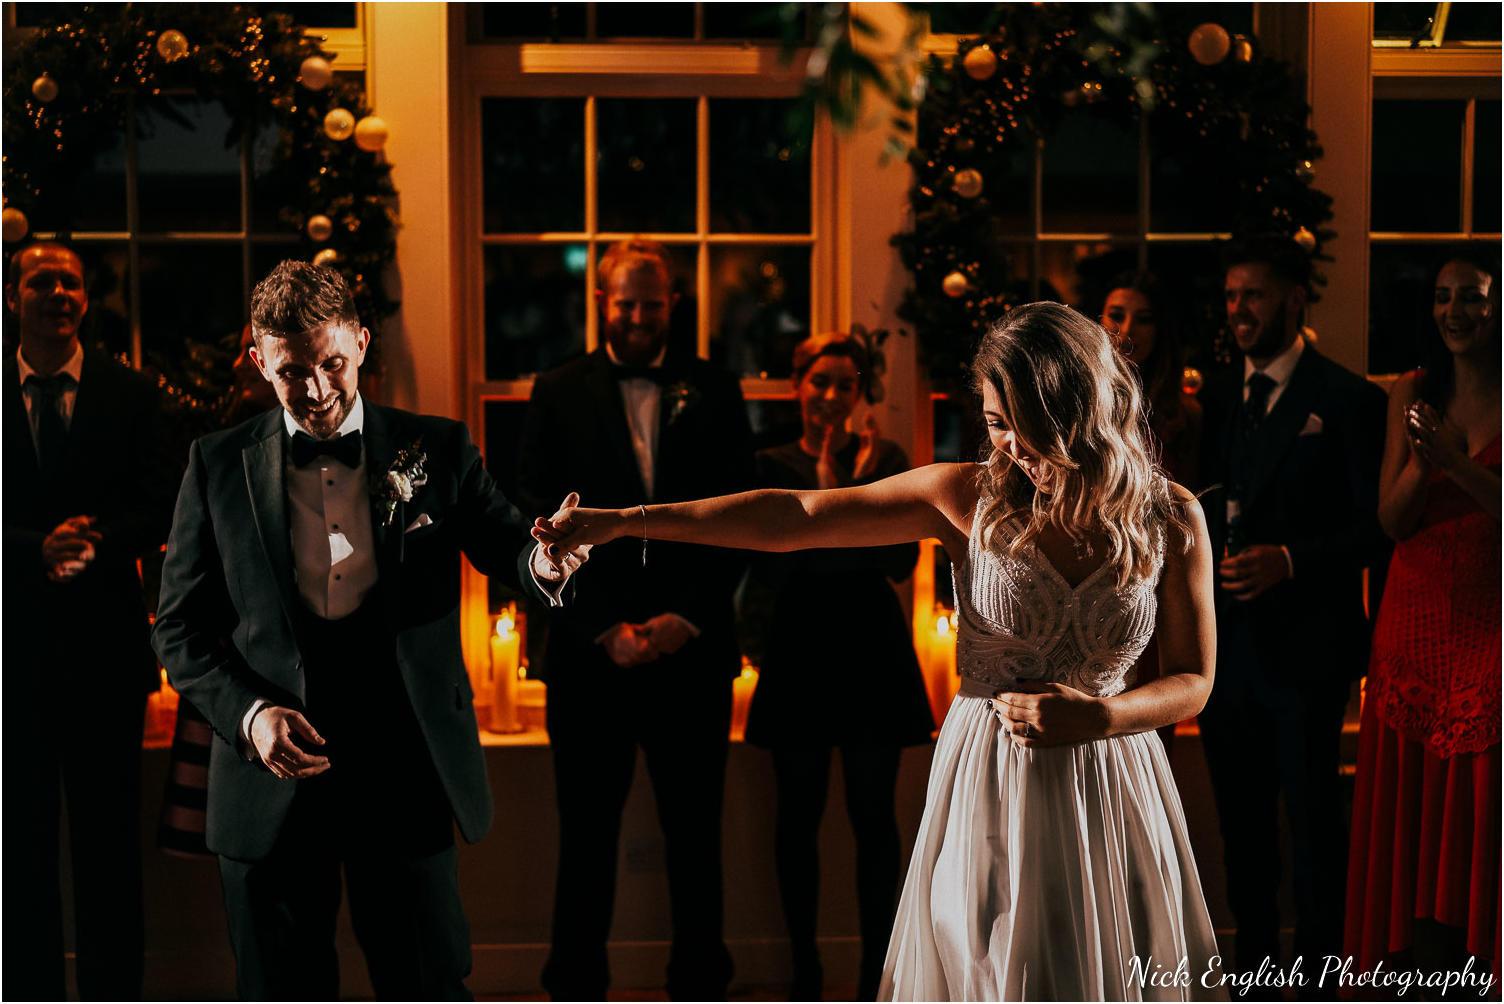 Mitton_Hall_Christmas_Winter_Wedding-84.jpg